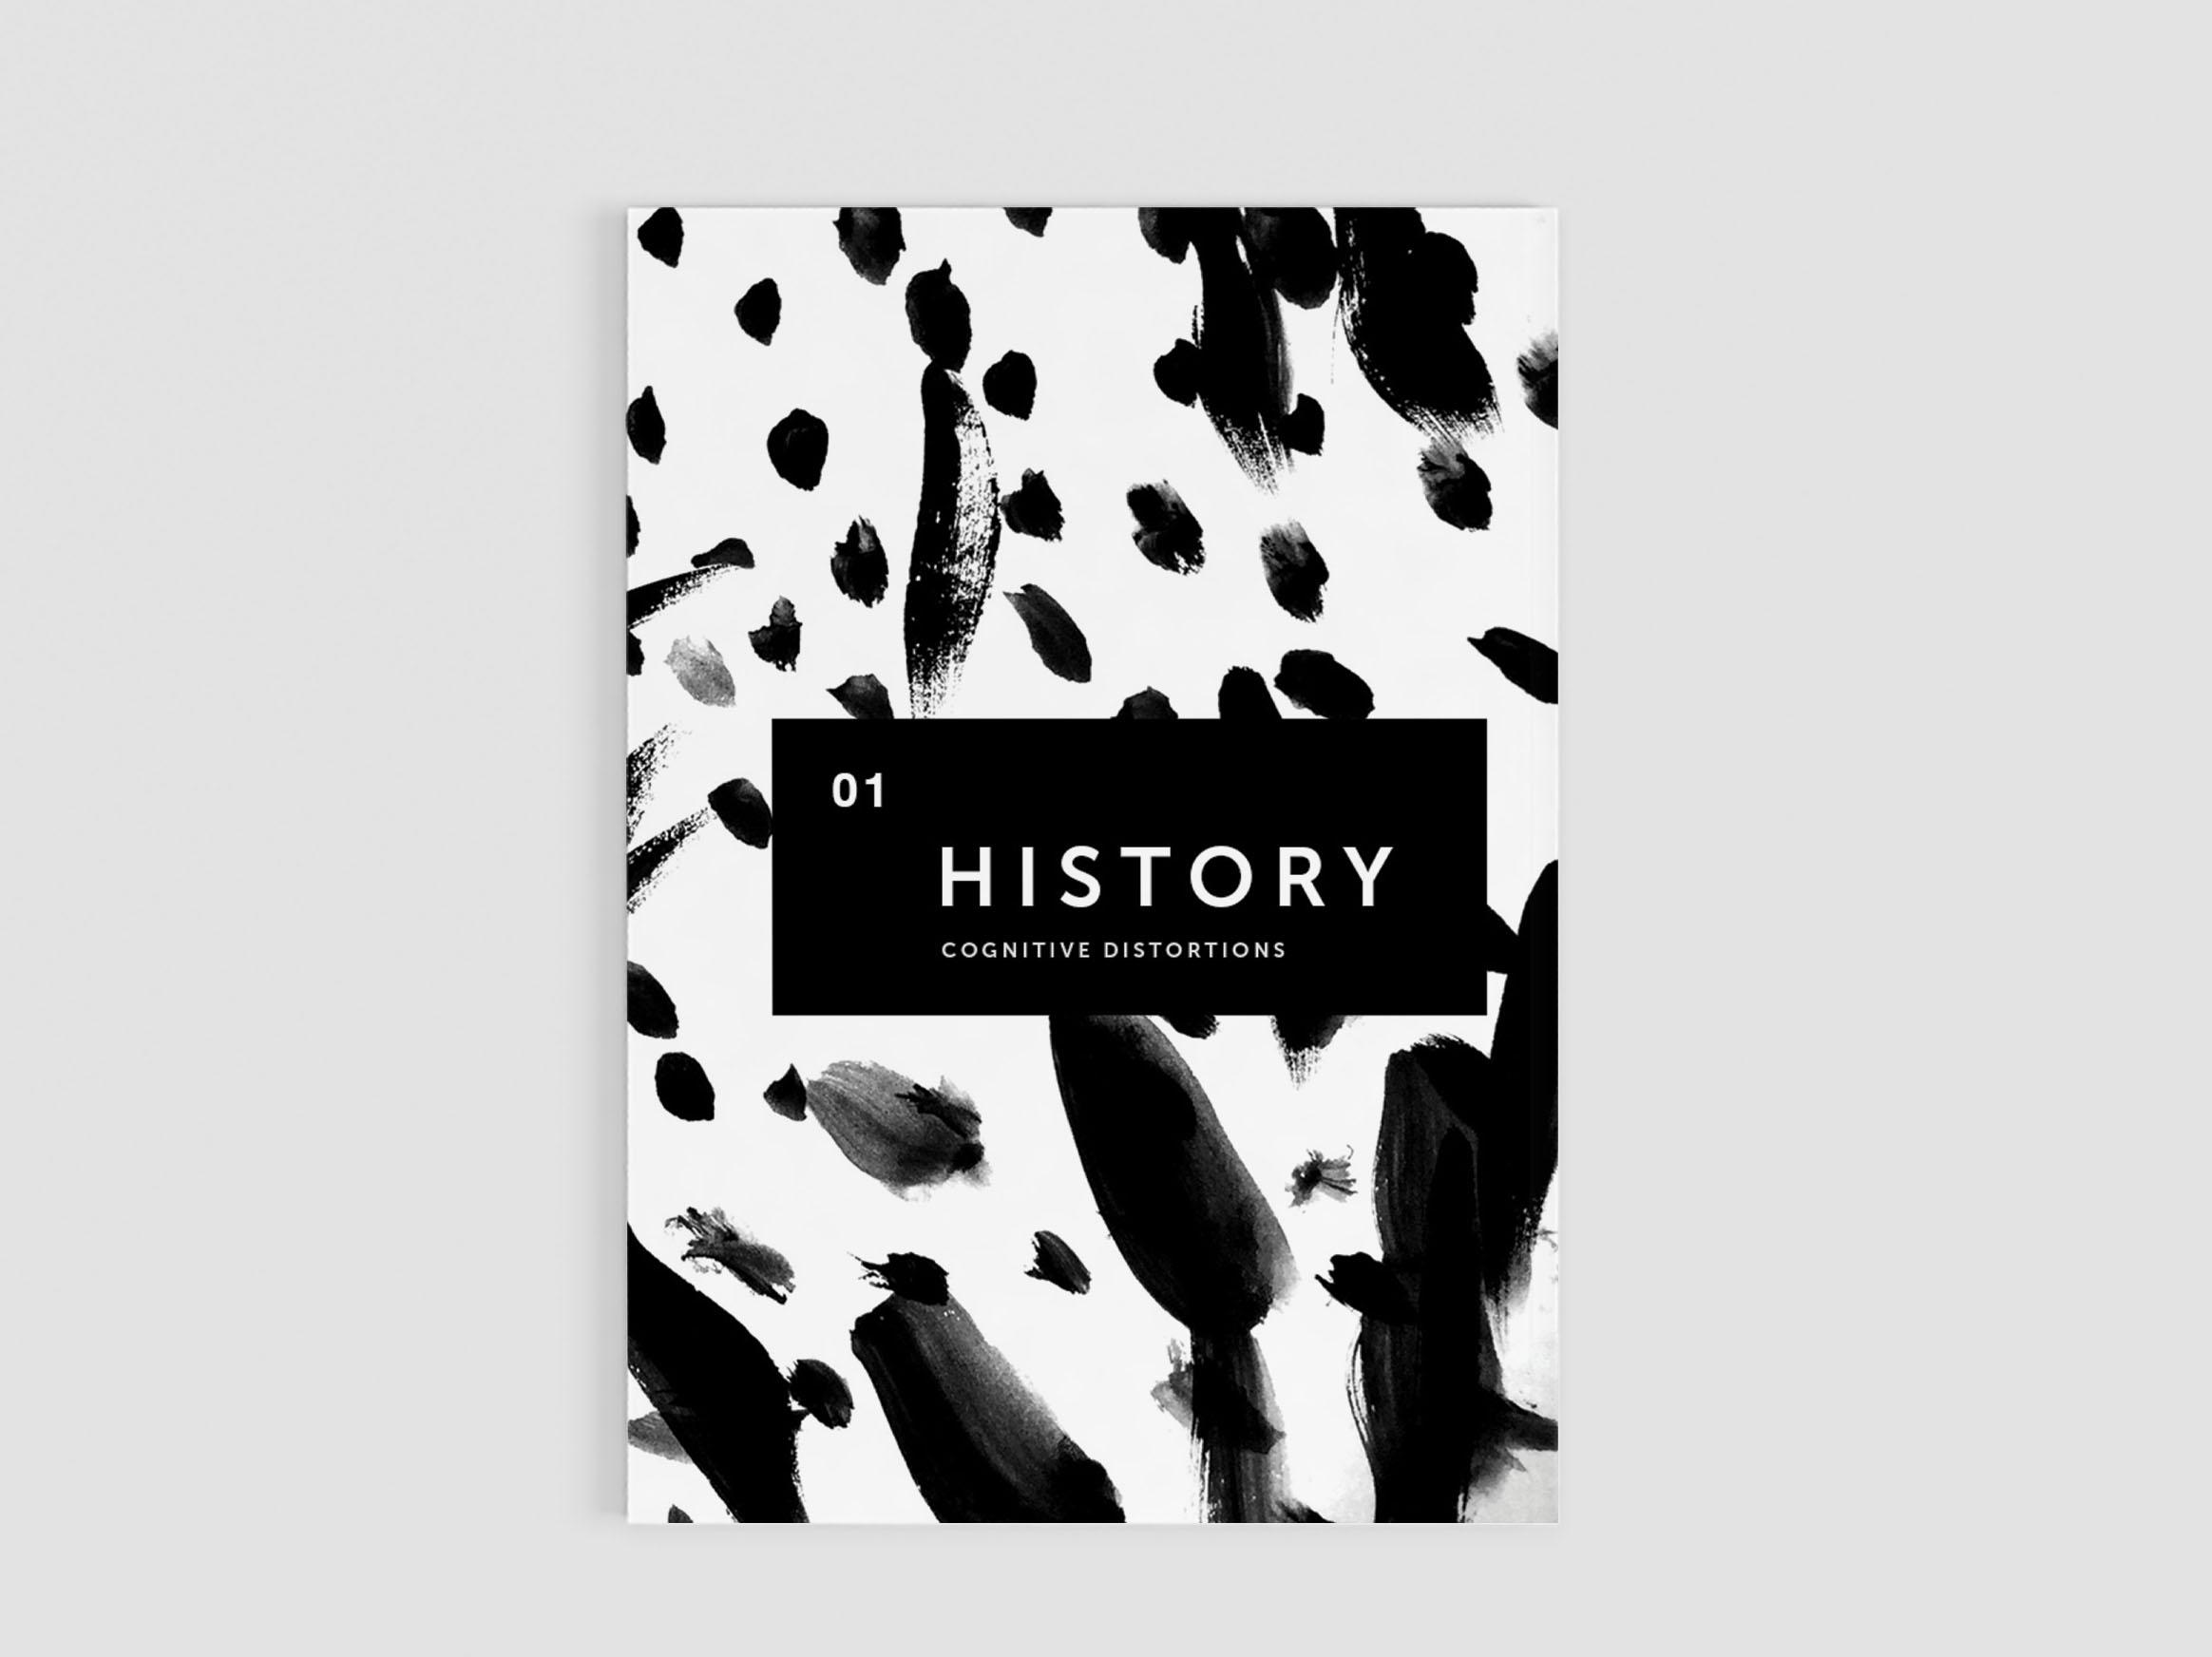 historycover.jpg